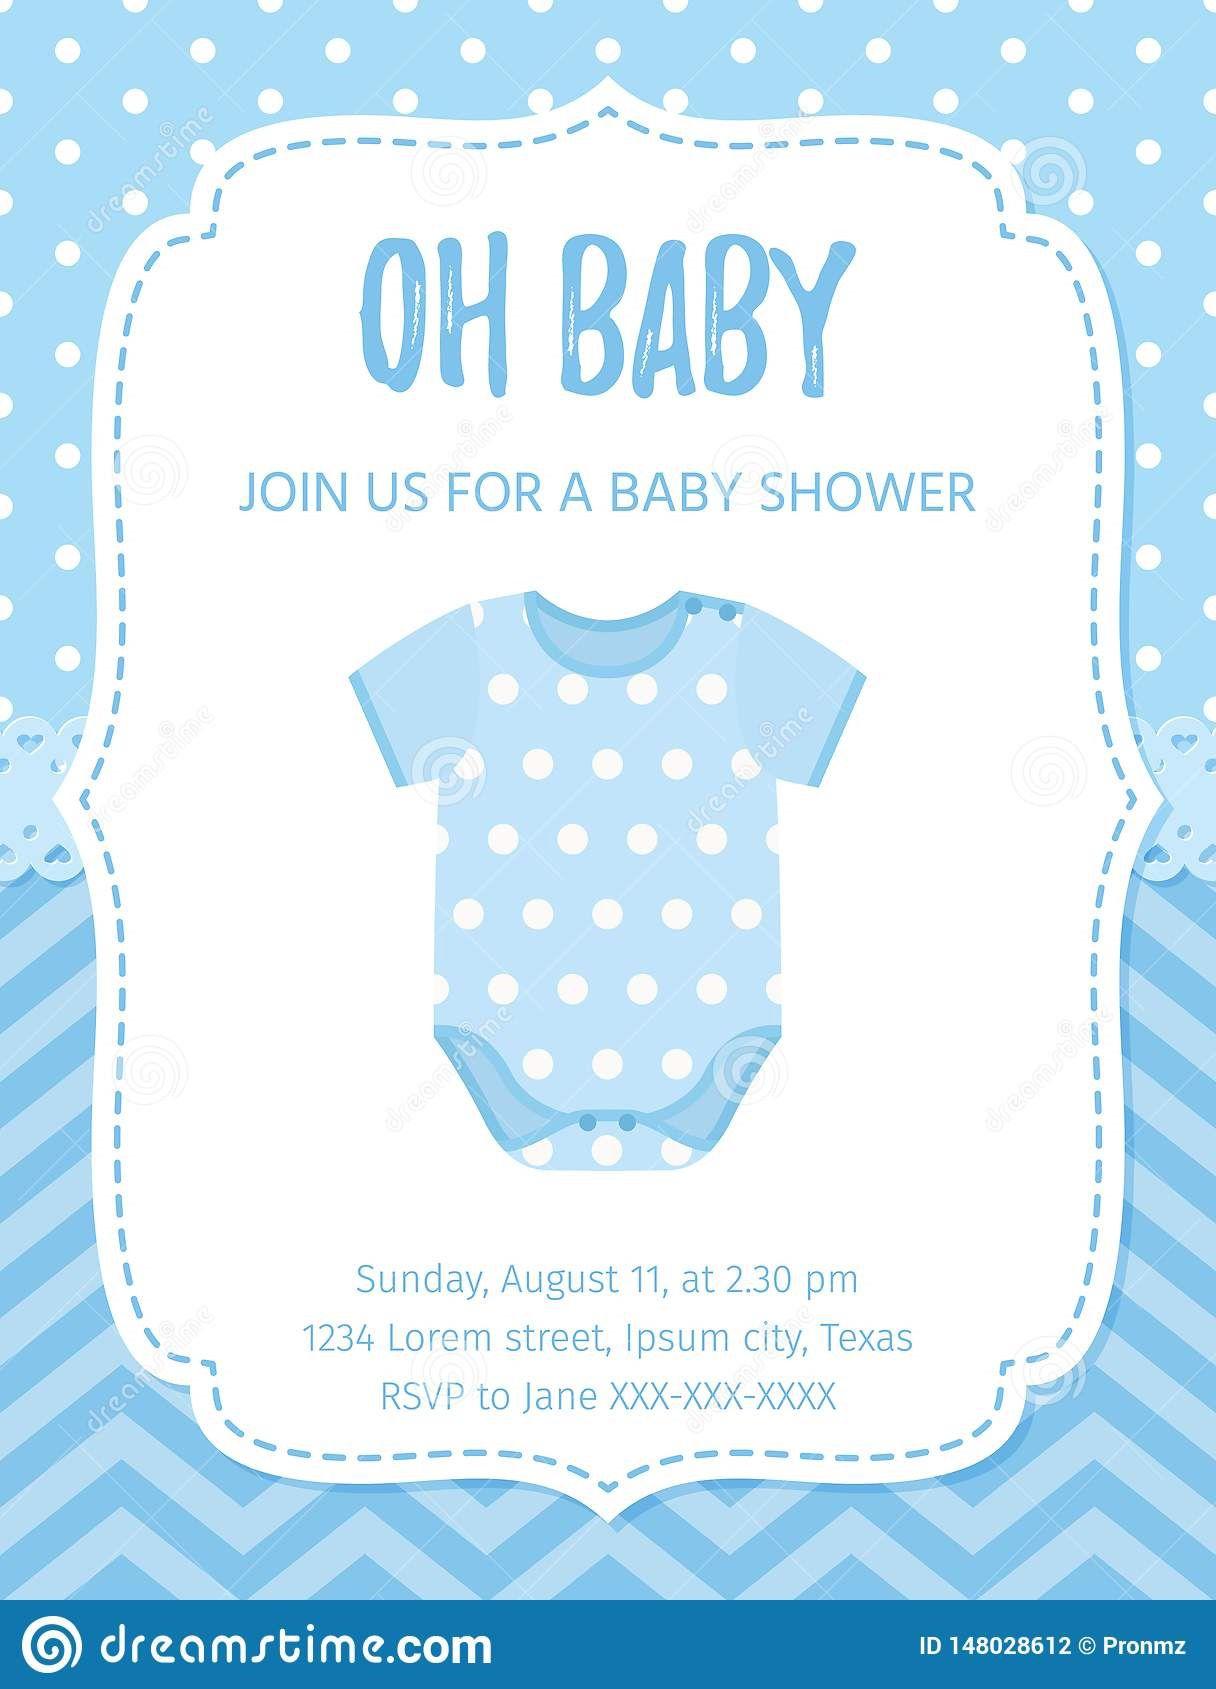 002 Stunning Baby Shower Card Design Free High Resolution  Template Microsoft Word Boy DownloadFull